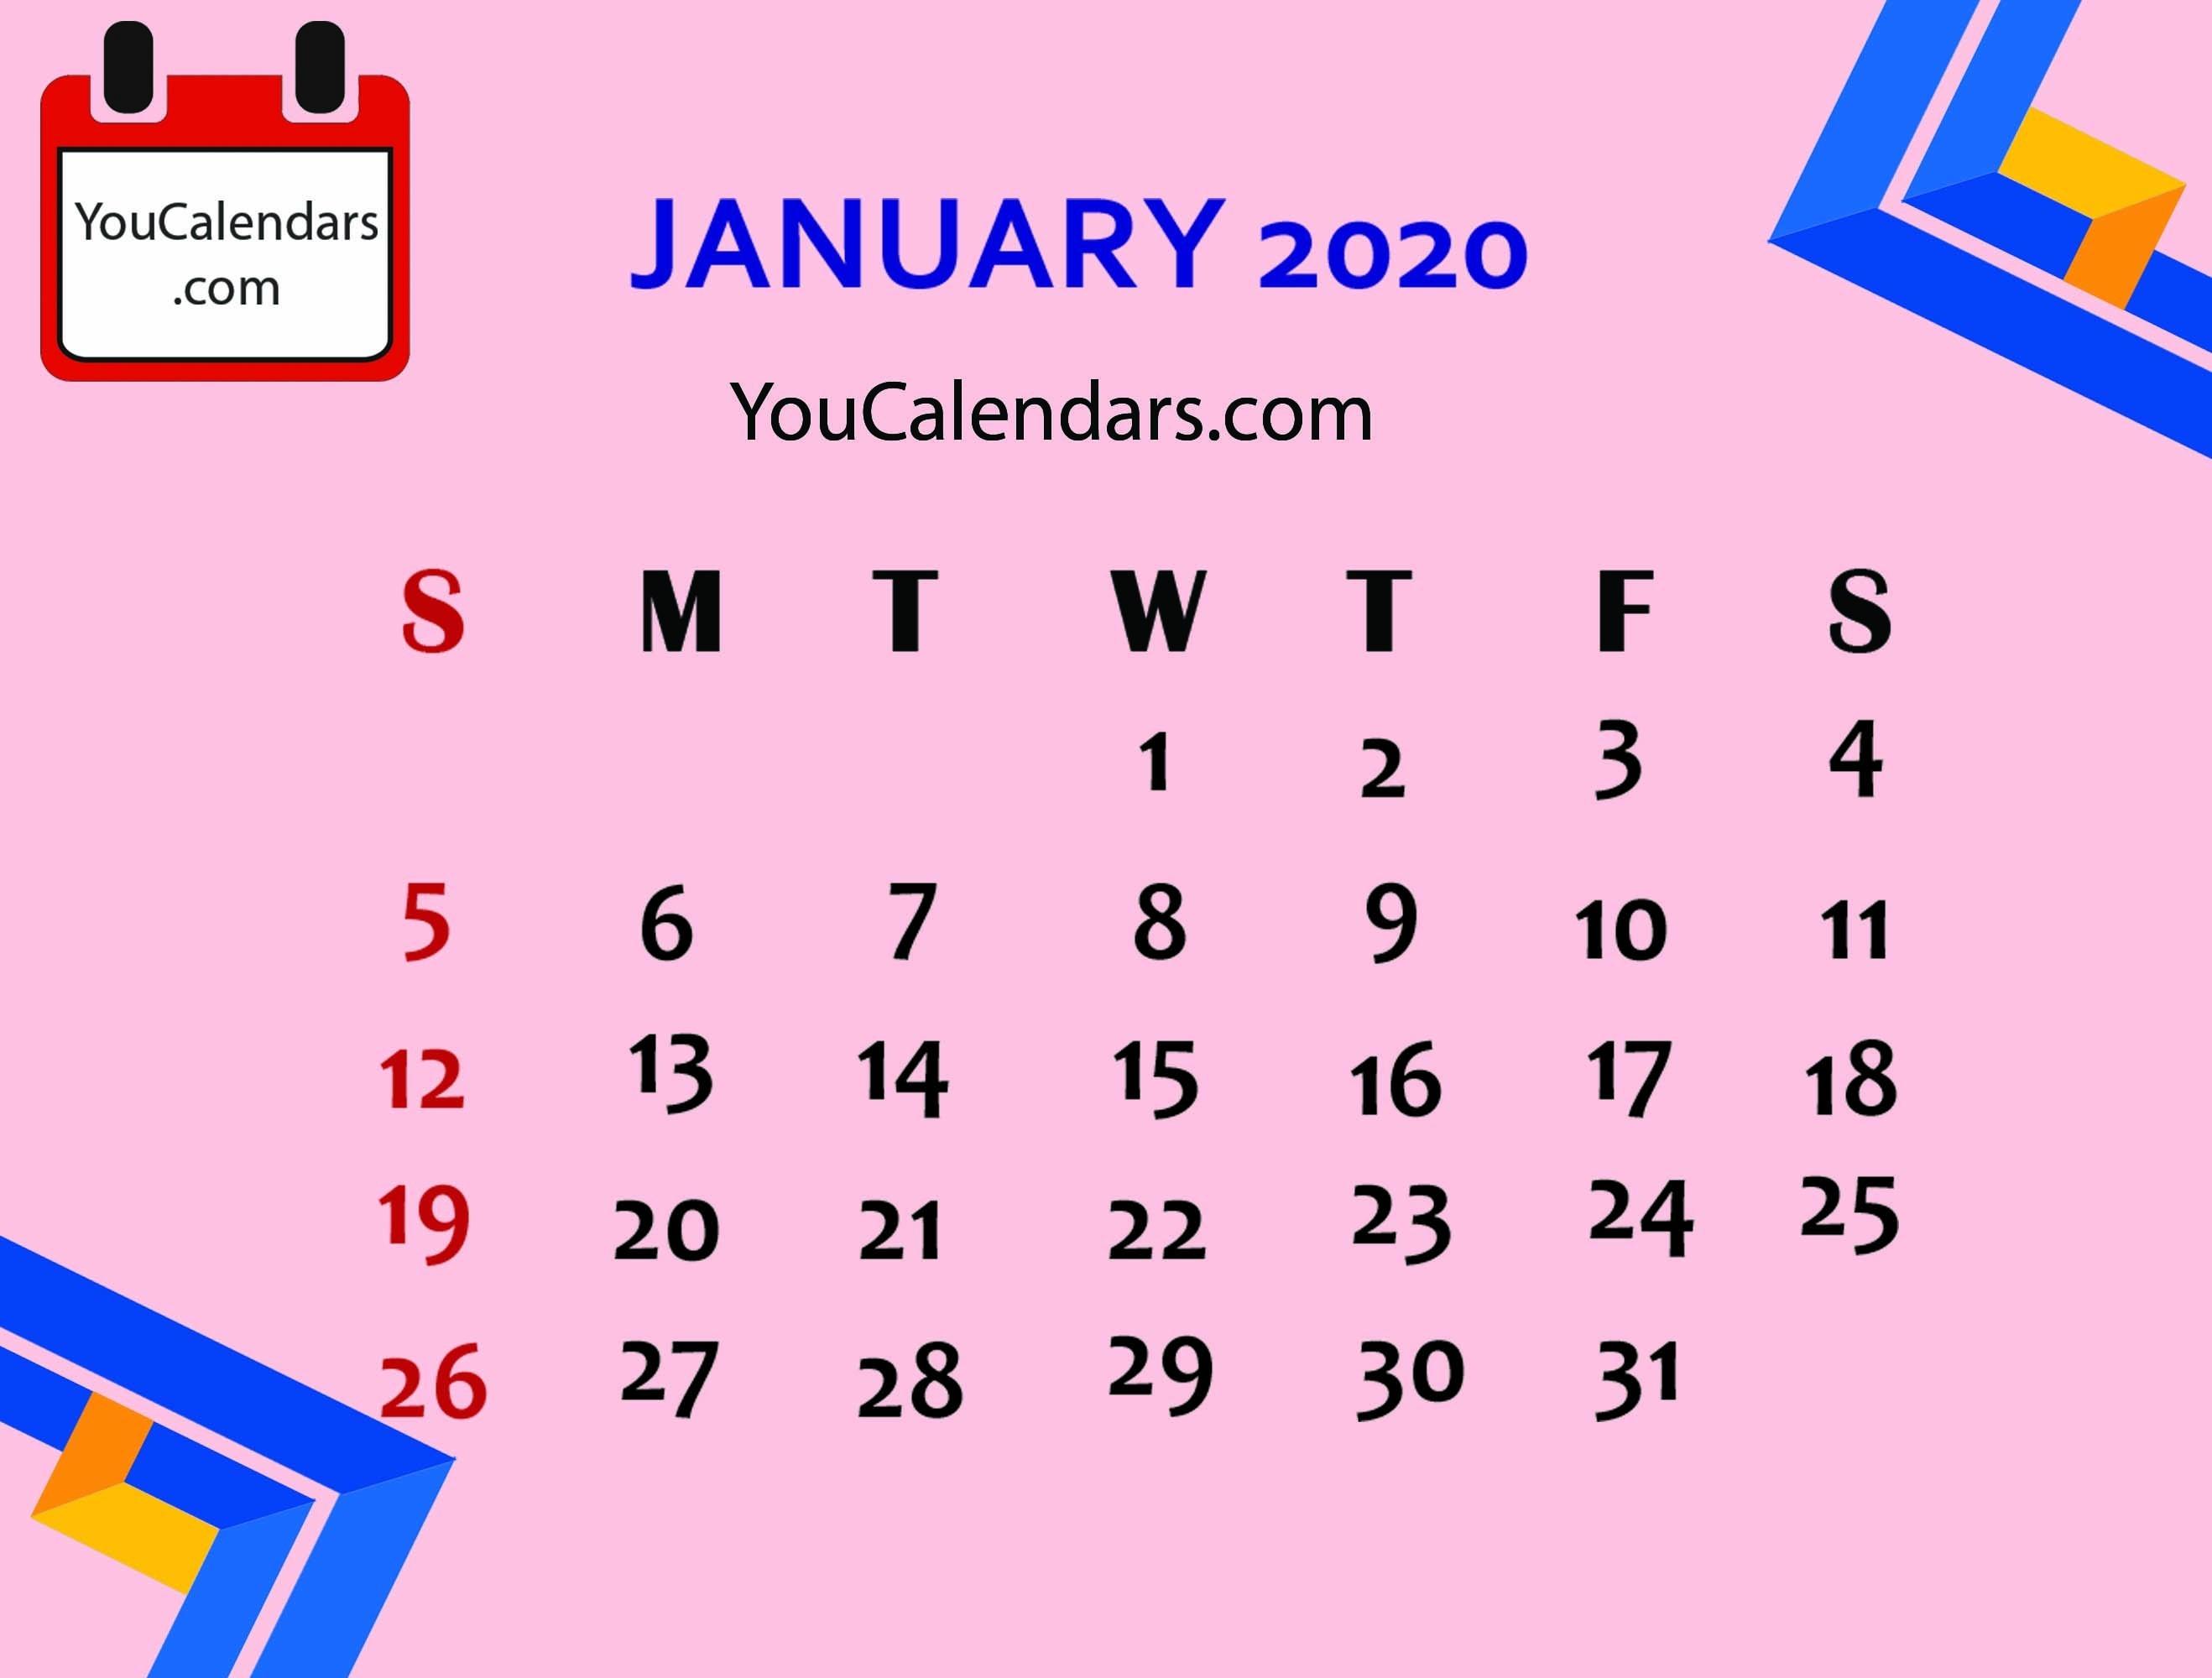 ✅Free January 2020 Calendar Printable Template - You Calendars-Blank W 9 To Print 2020